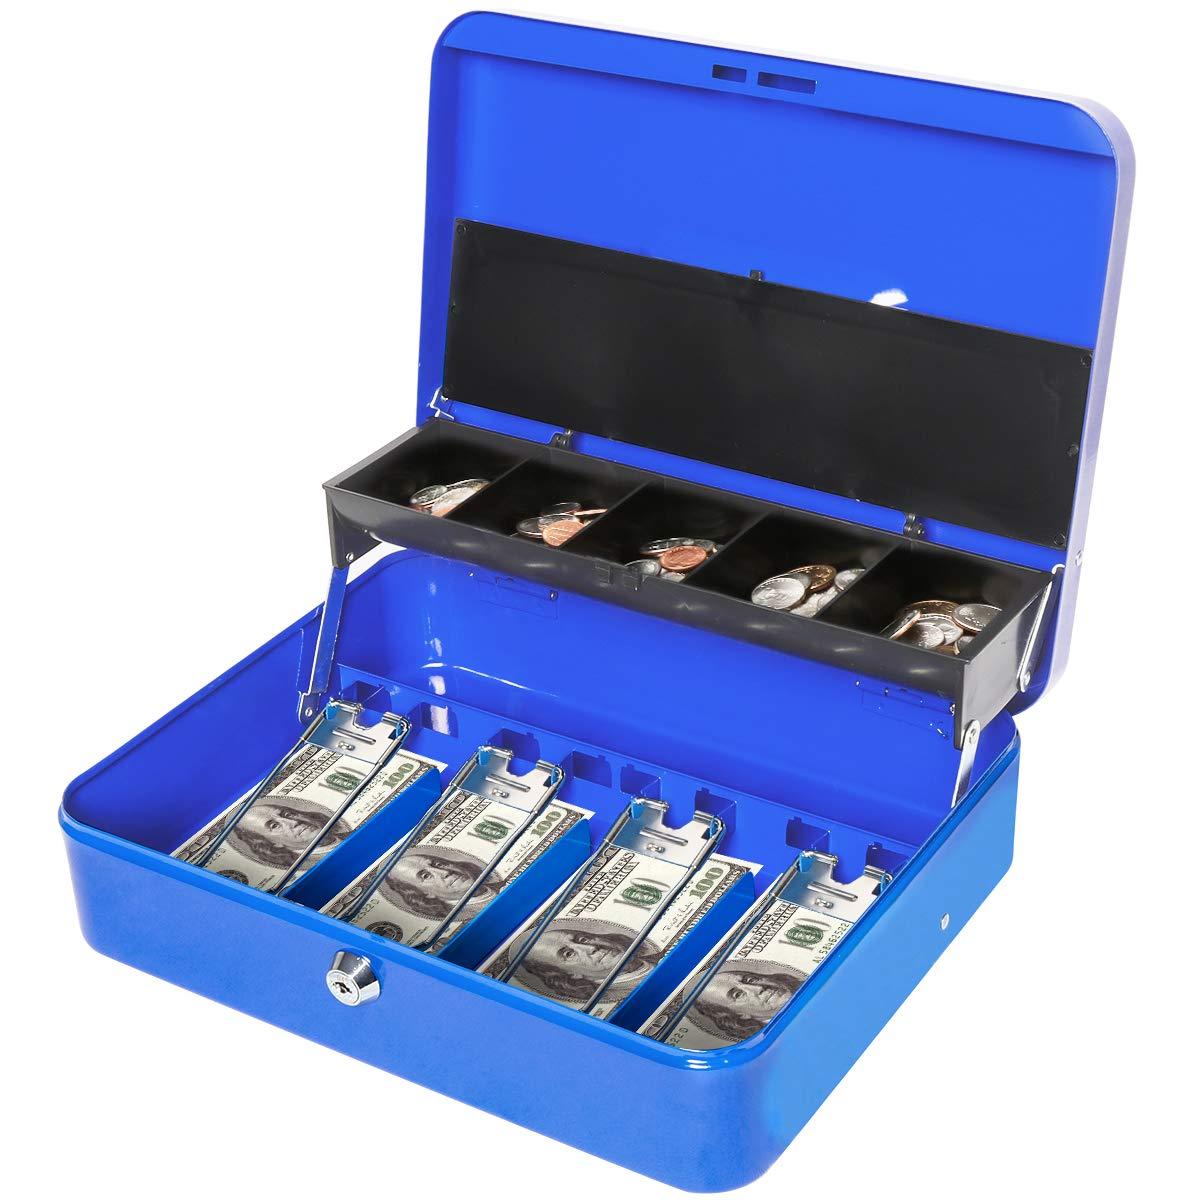 2656d0dce2df Jssmst Locking Large Metal Cash Box with Money Tray, Lock Money Box with  Key, Blue, CB00513XL